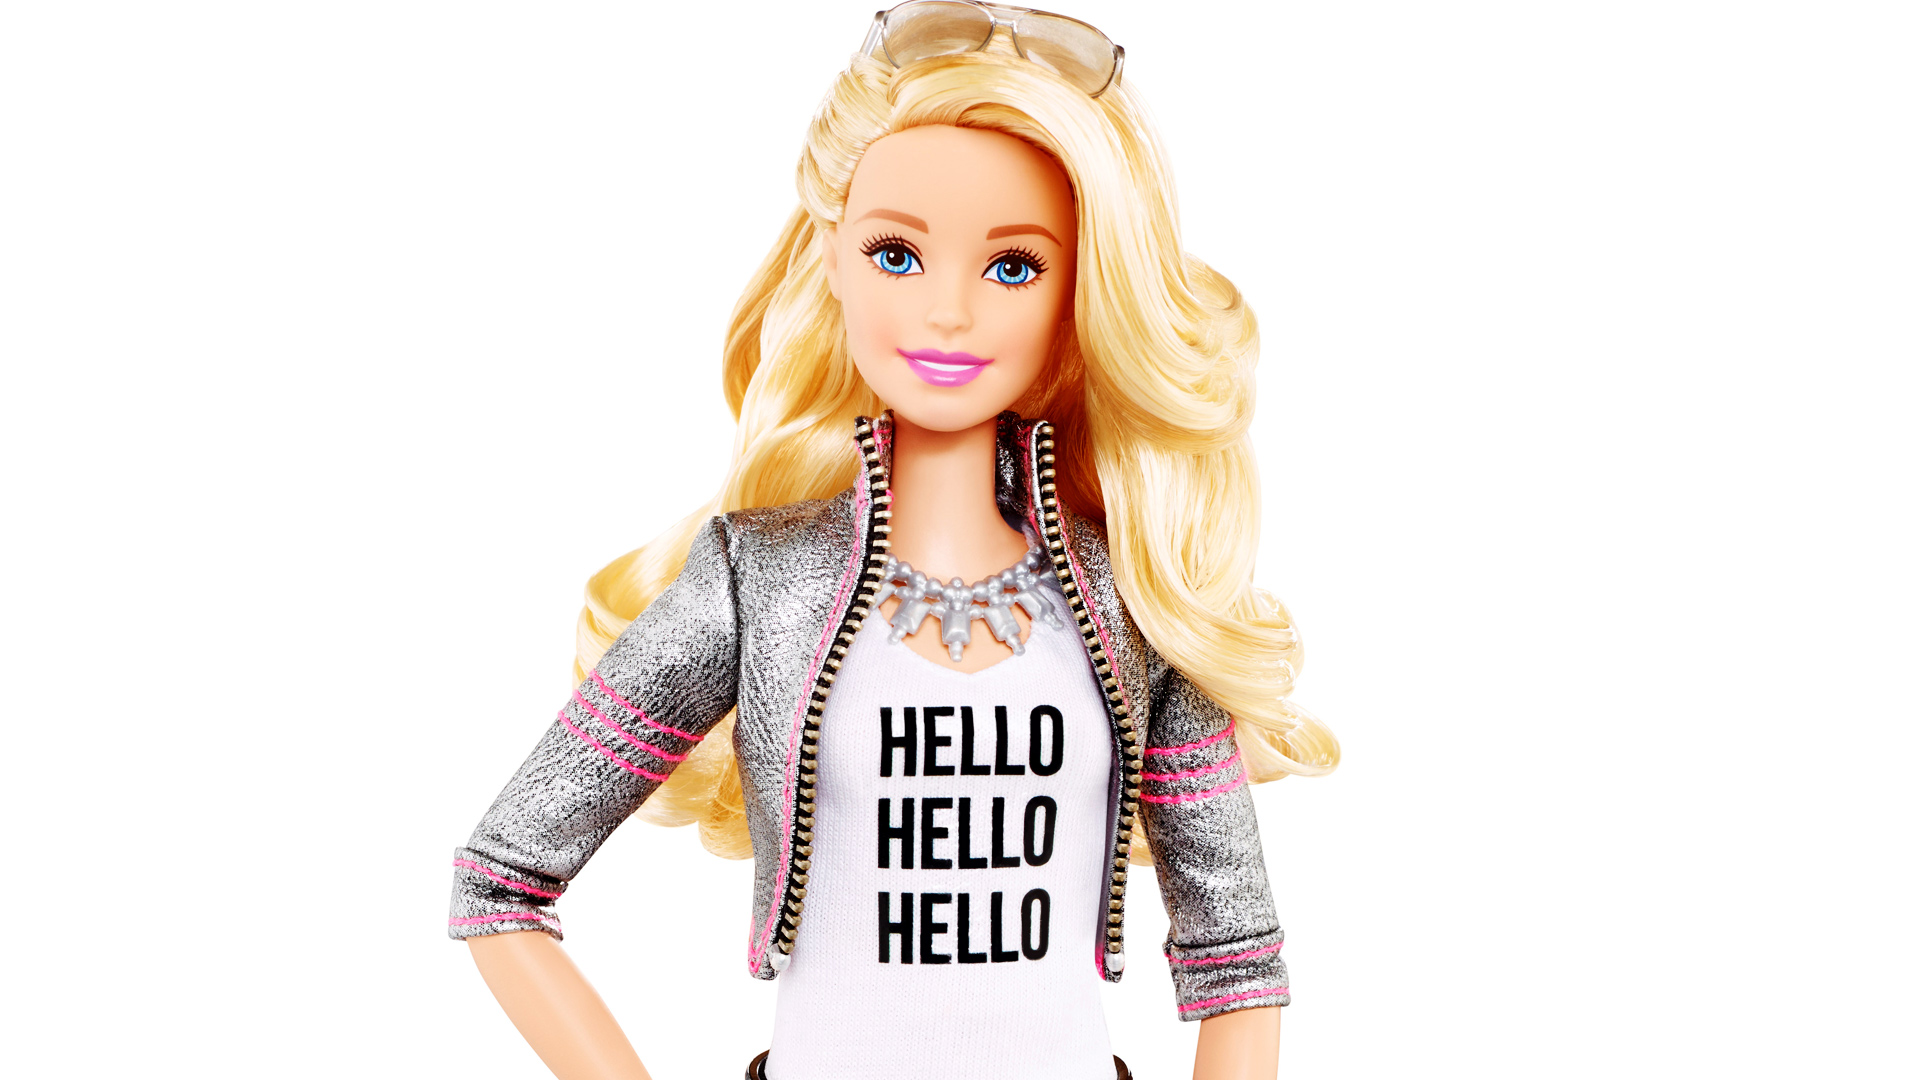 High Resolution Wallpaper   Barbie 1920x1080 px